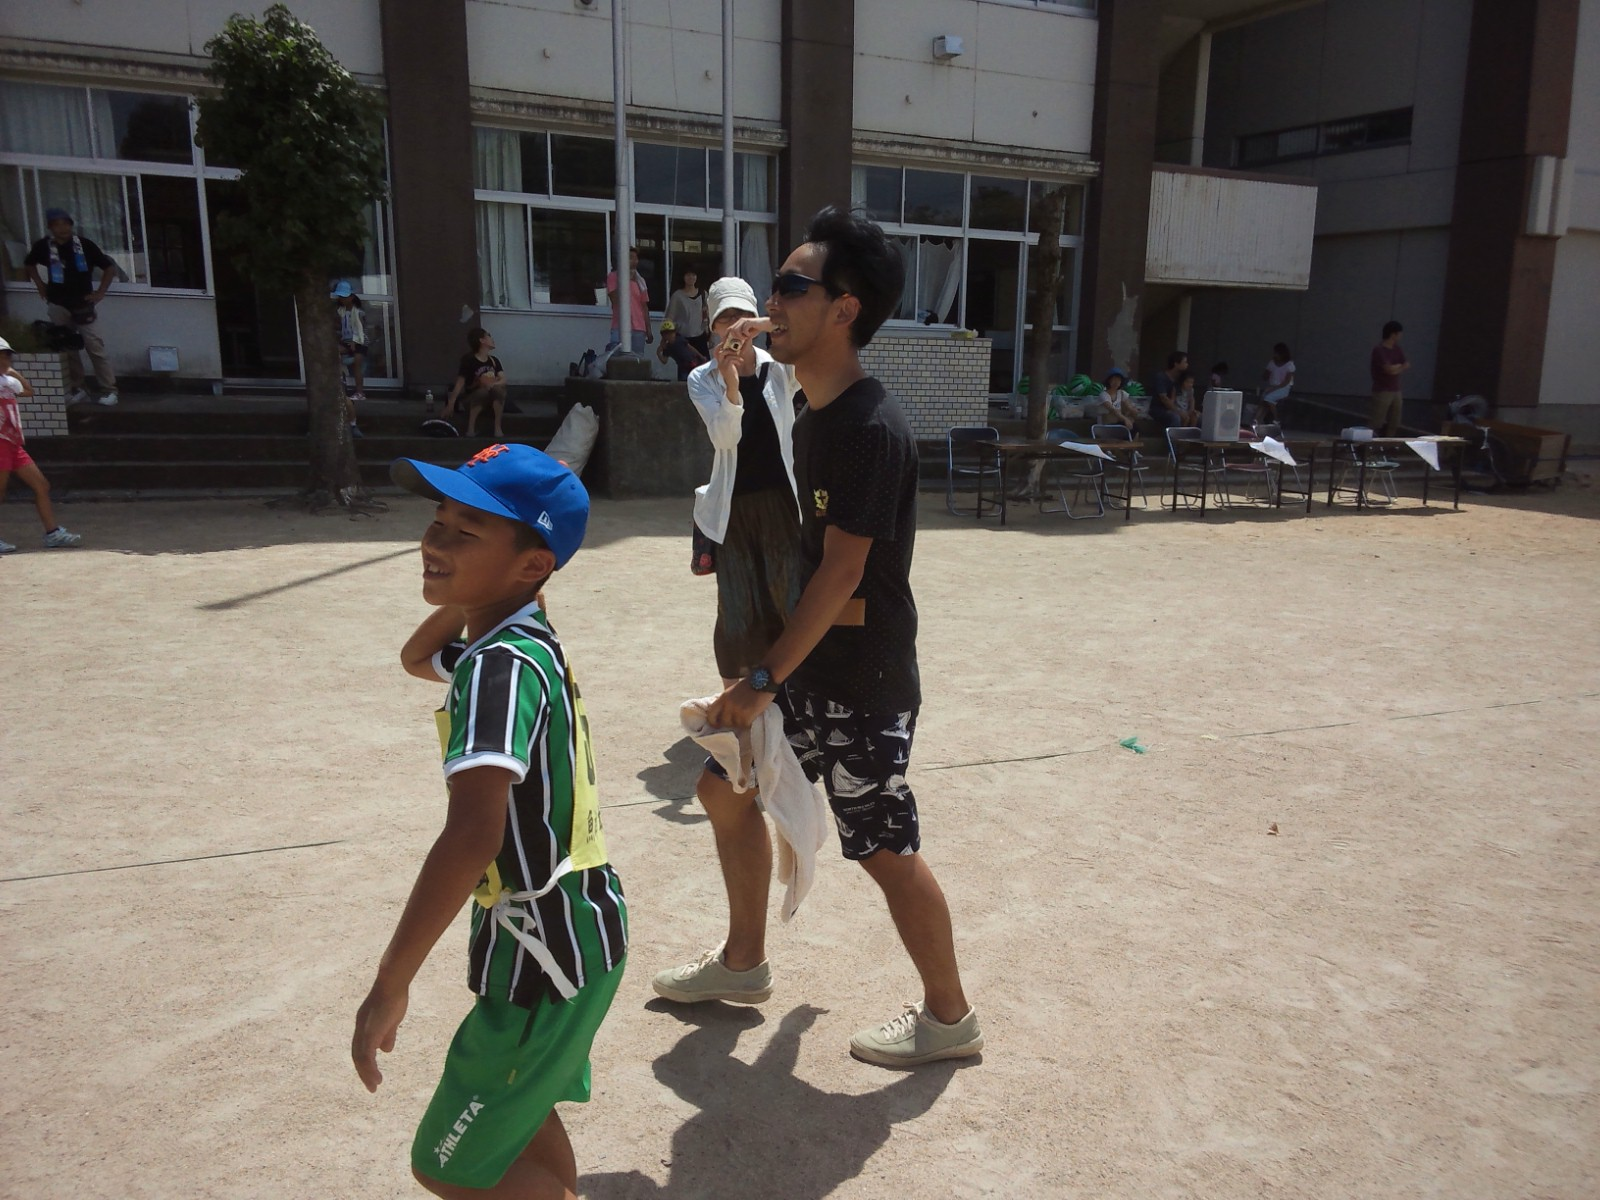 http://n-ko.jp/staffblog/NCM_0073223.JPG